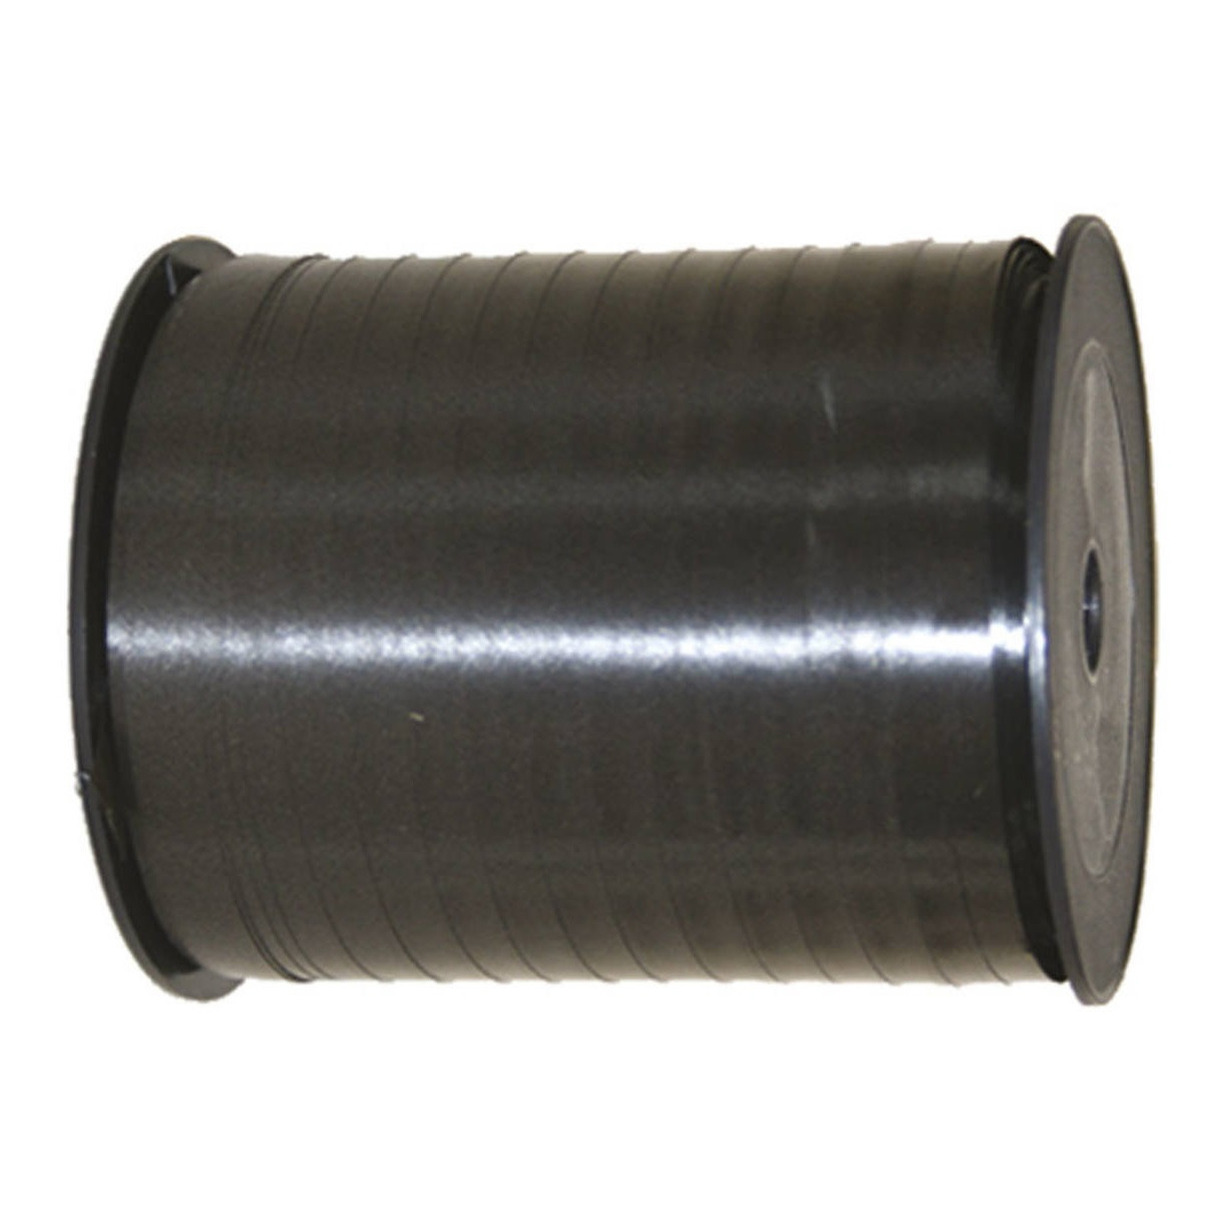 Cadeaulint/sierlint in de kleur zwart 5 mm x 500 meter